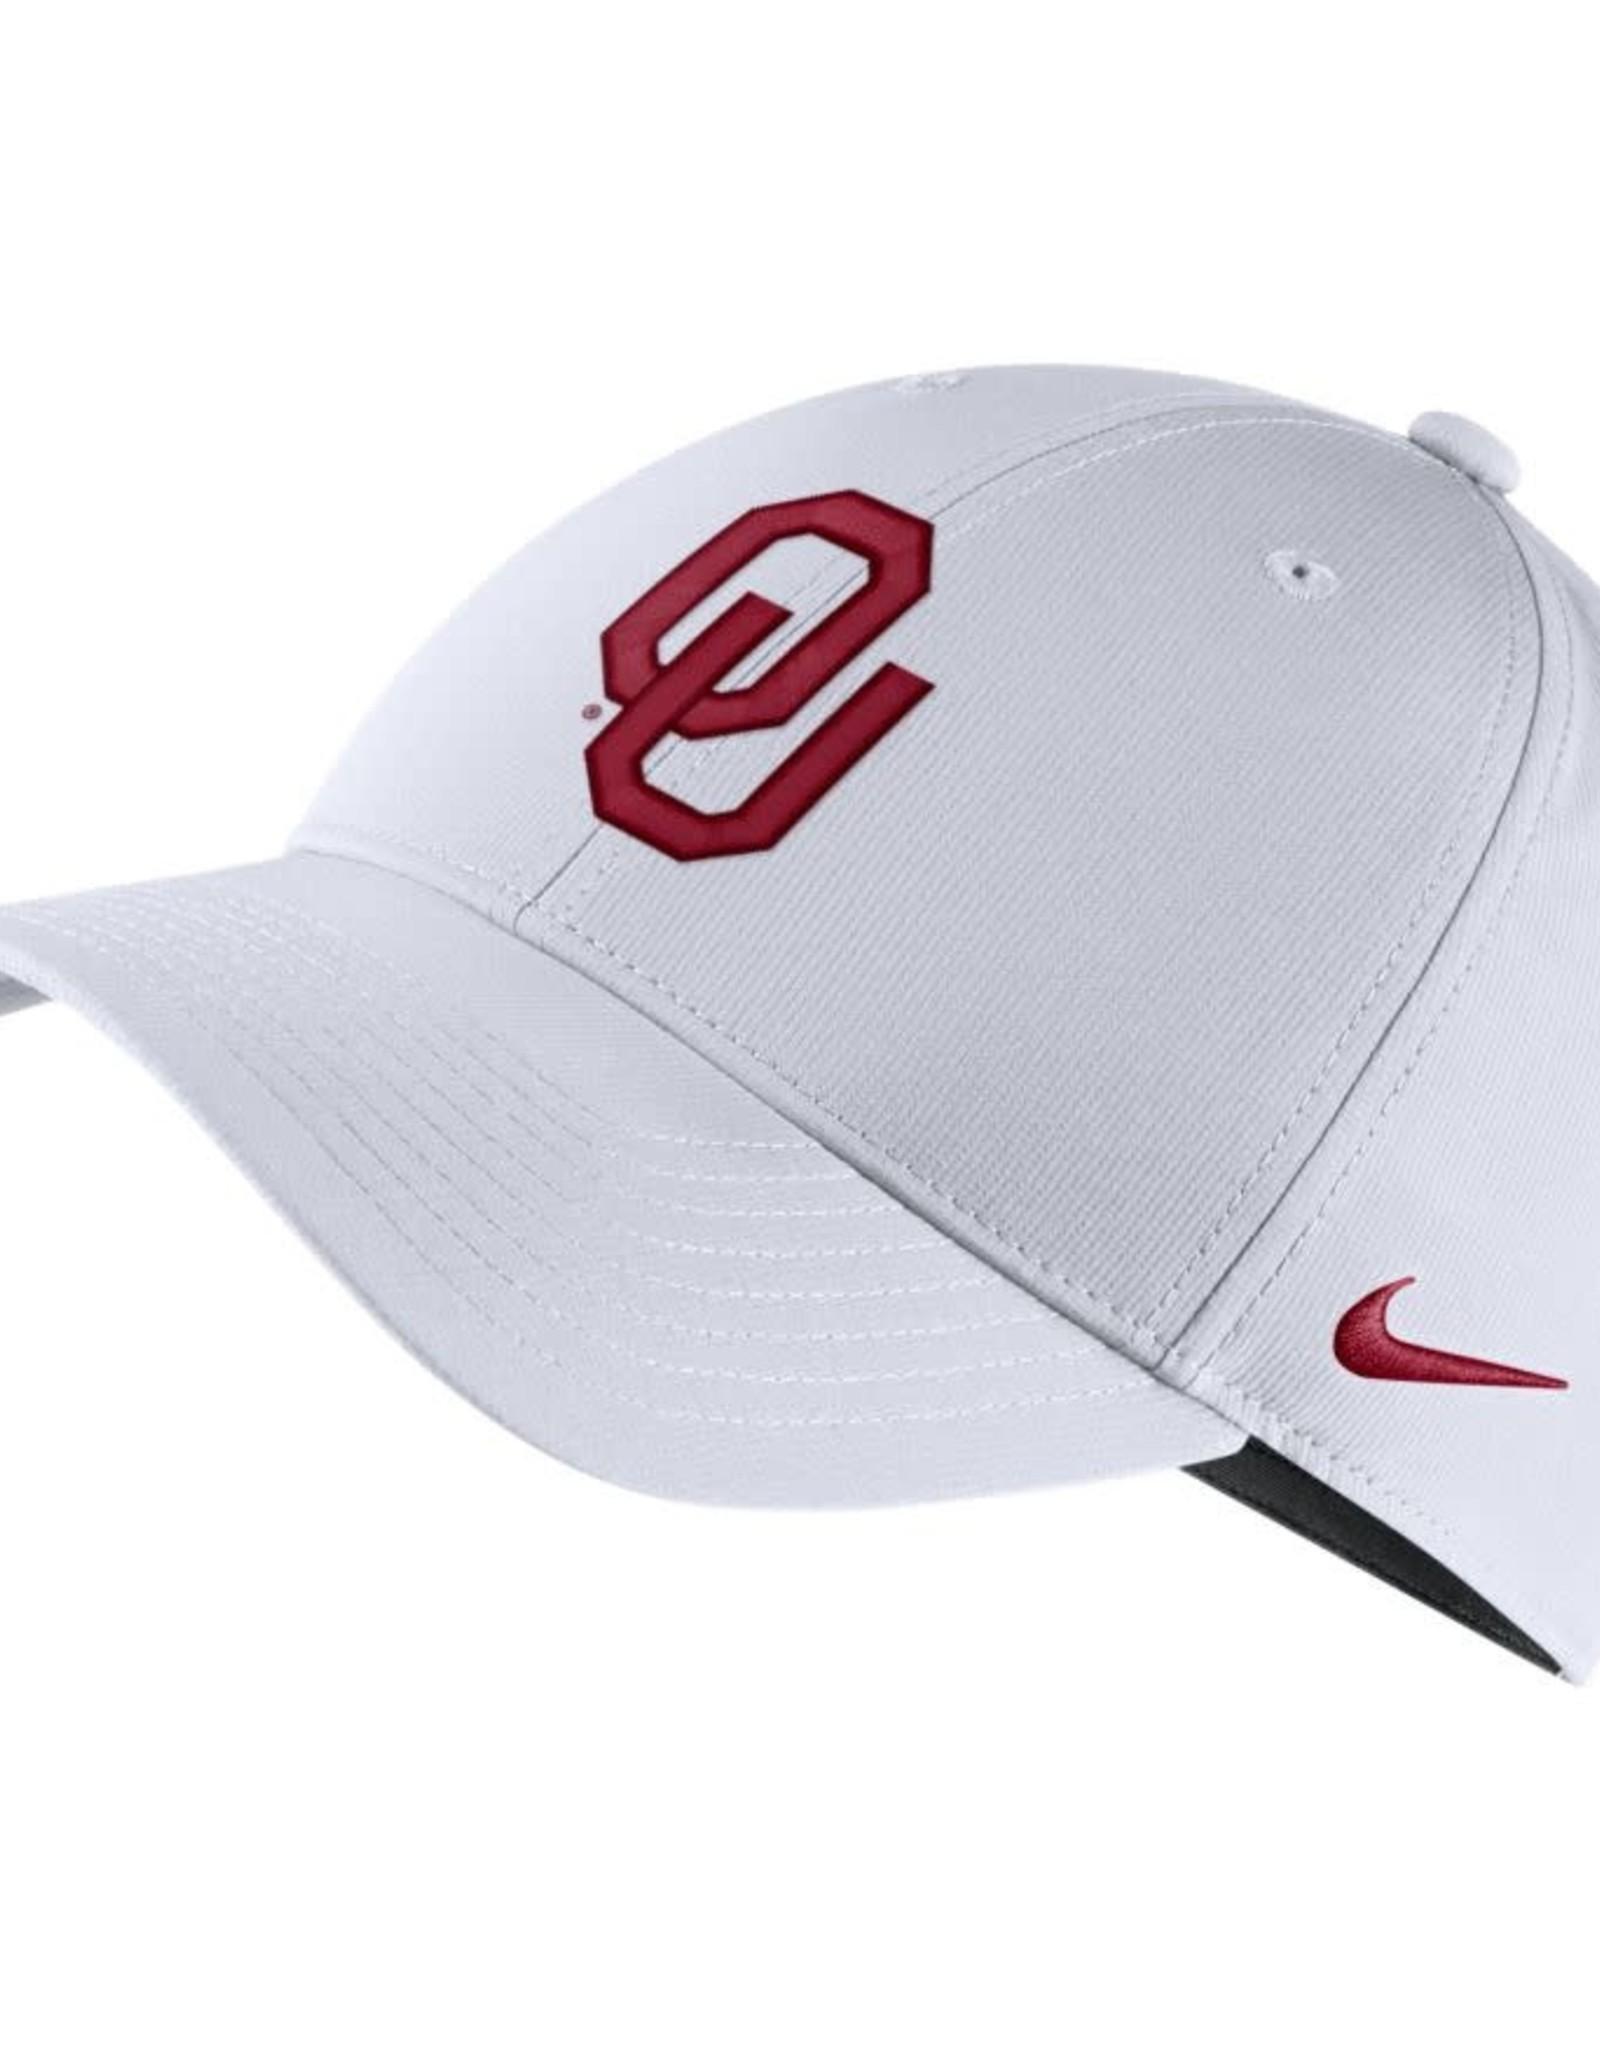 Nike Nike White OU Legacy91 Adjustable Cap